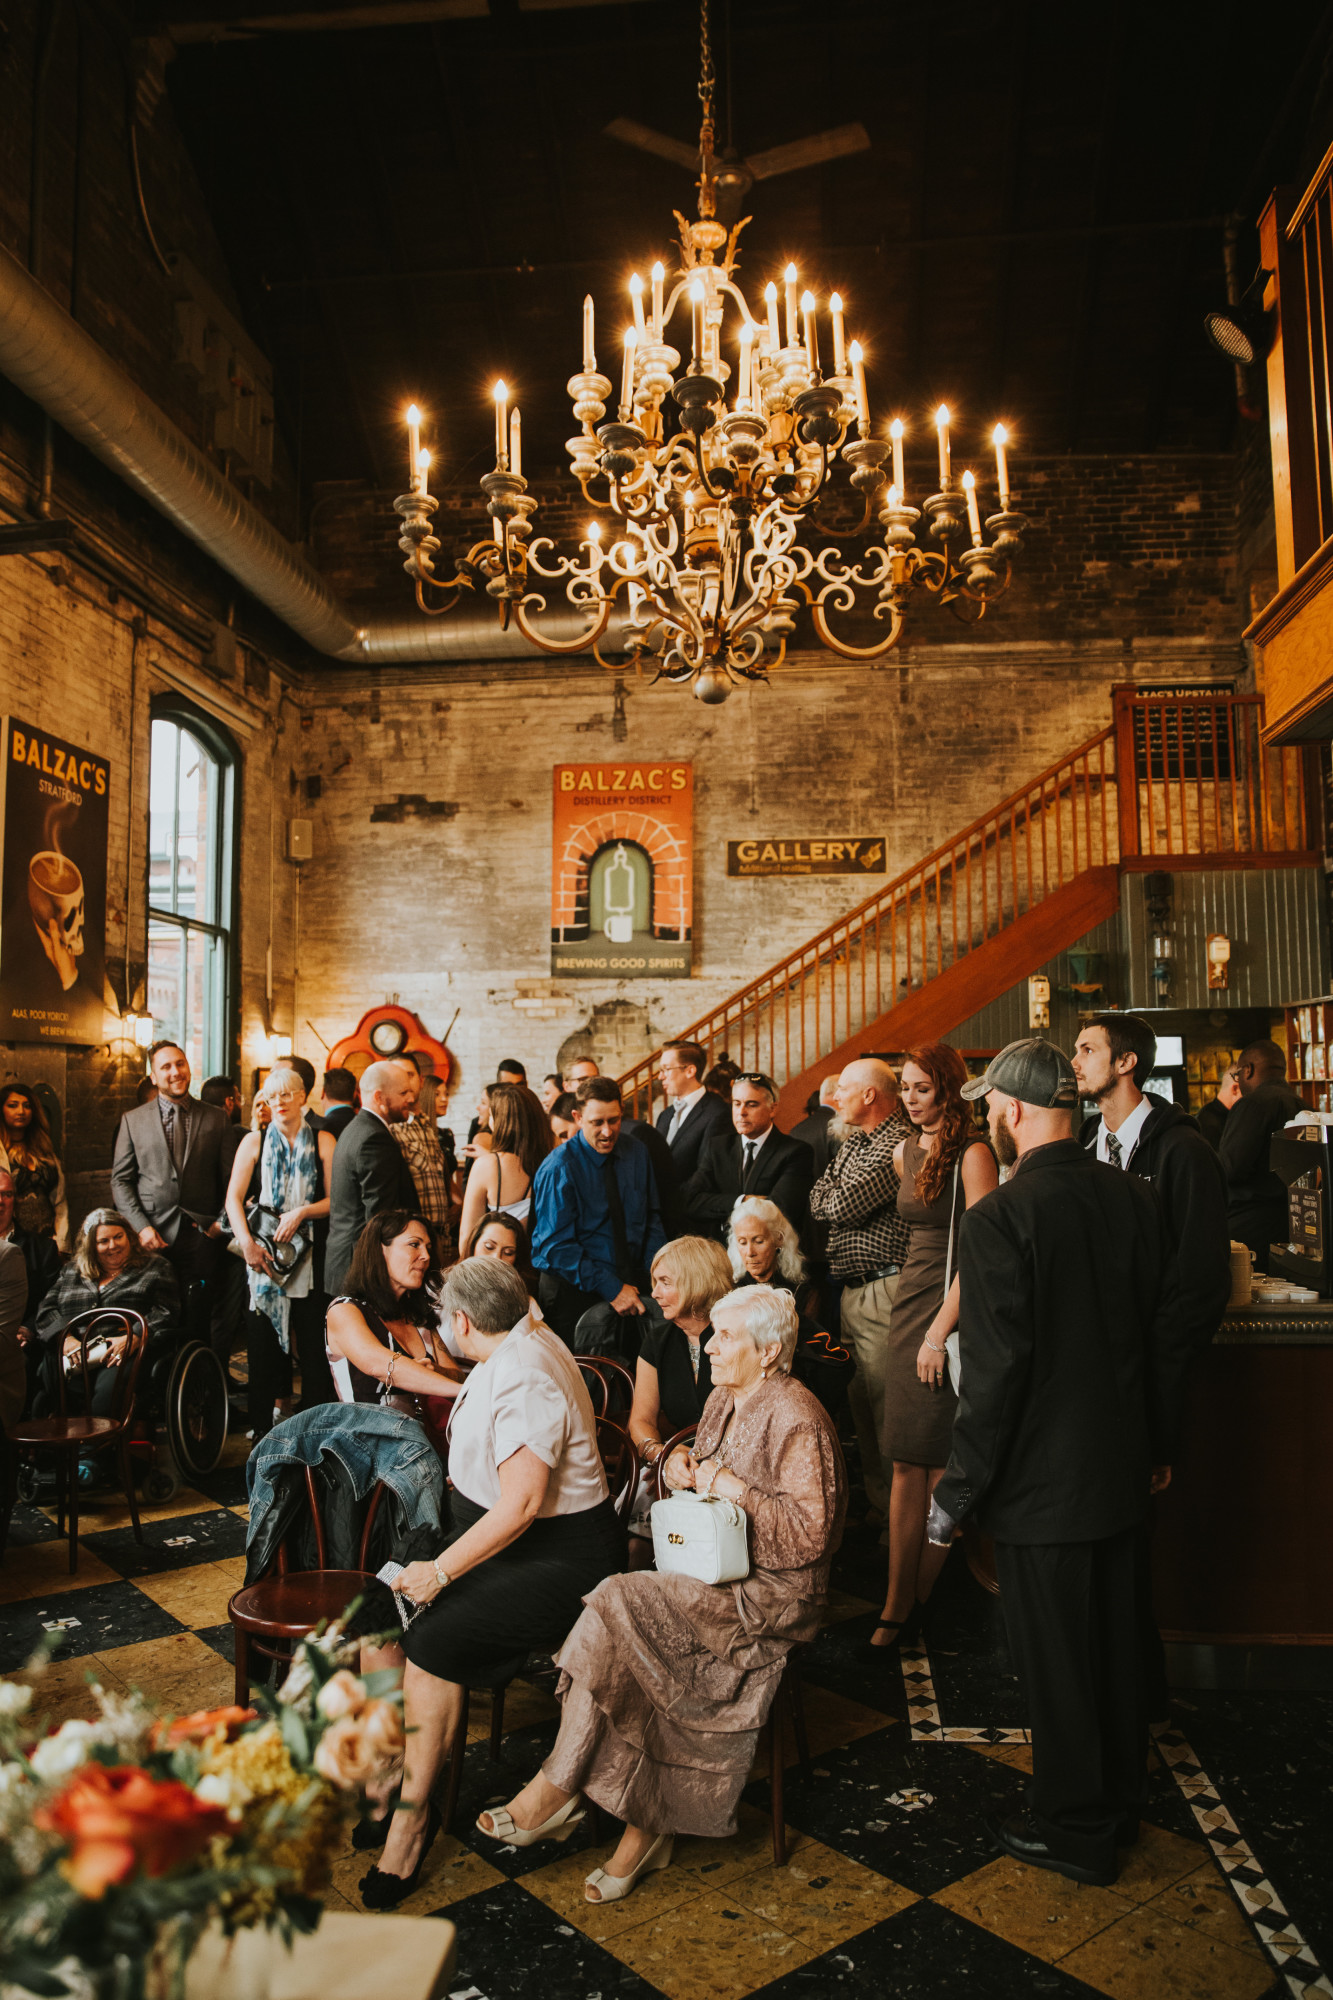 Beth-Ted-Balzacs-Coffee-Distillery-District-Toronto-Wedding-Planning-INLY-Events-Lushana-Bale-Photography-0154.jpg